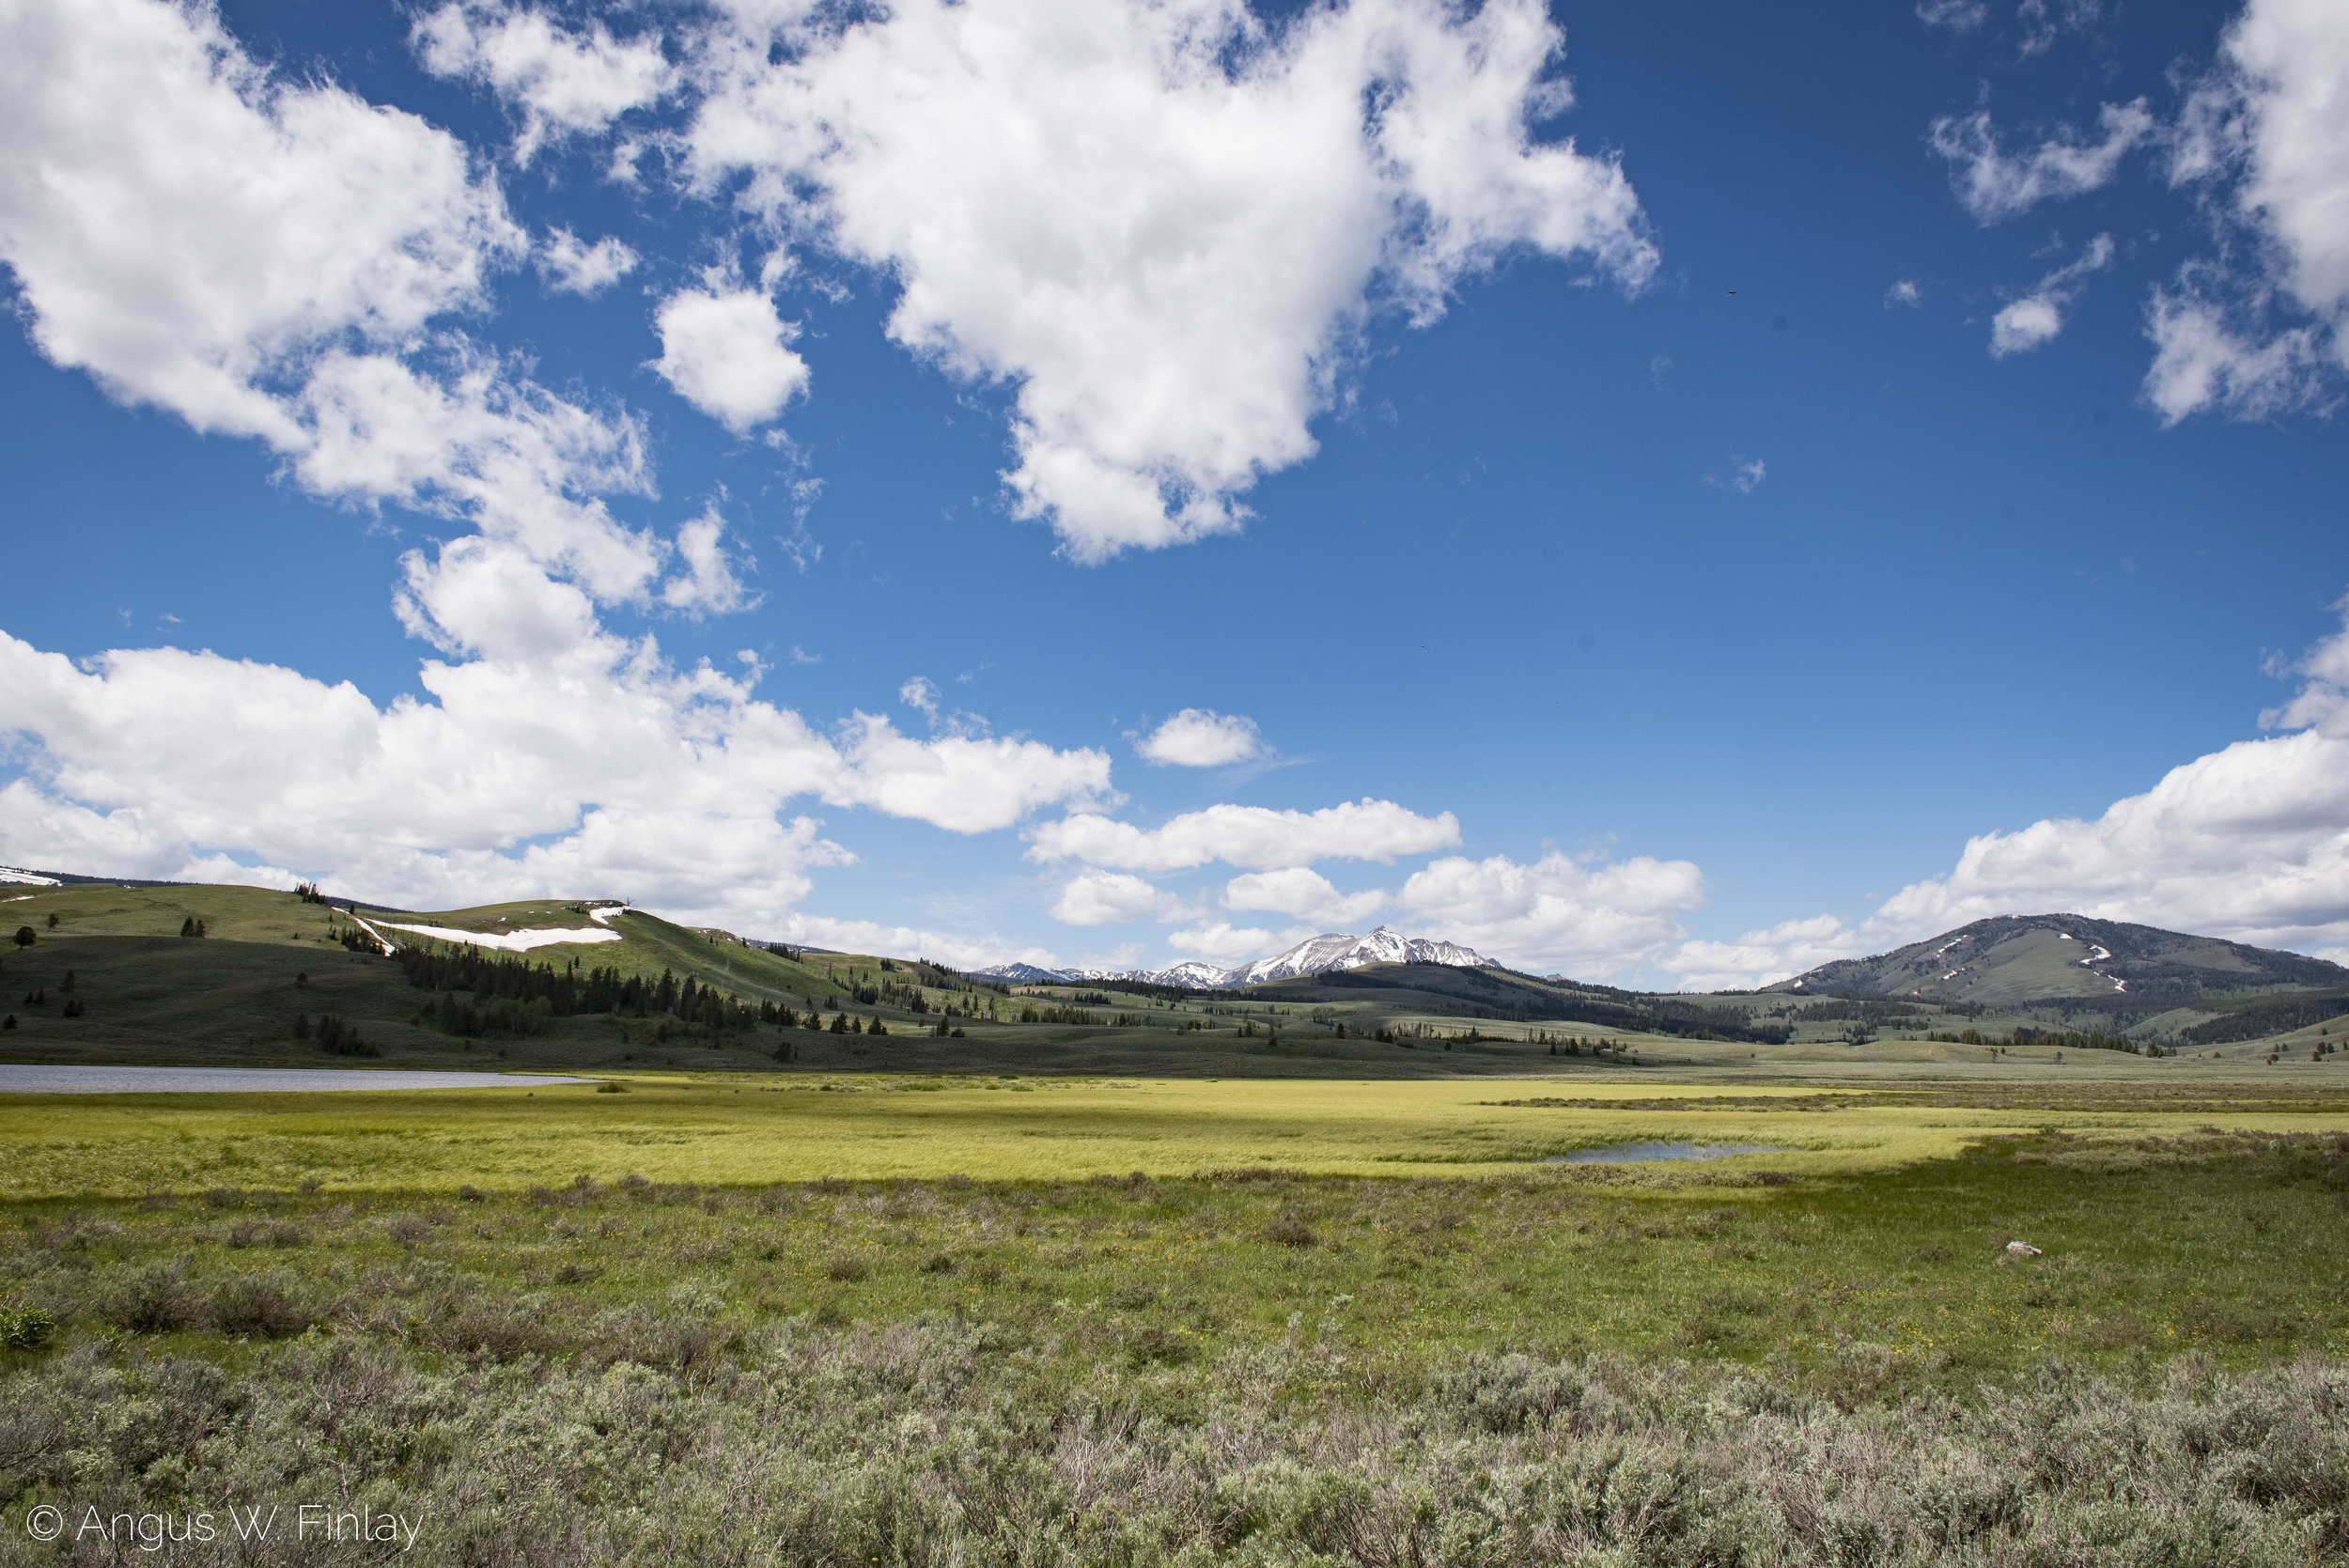 Upper Yellowstone